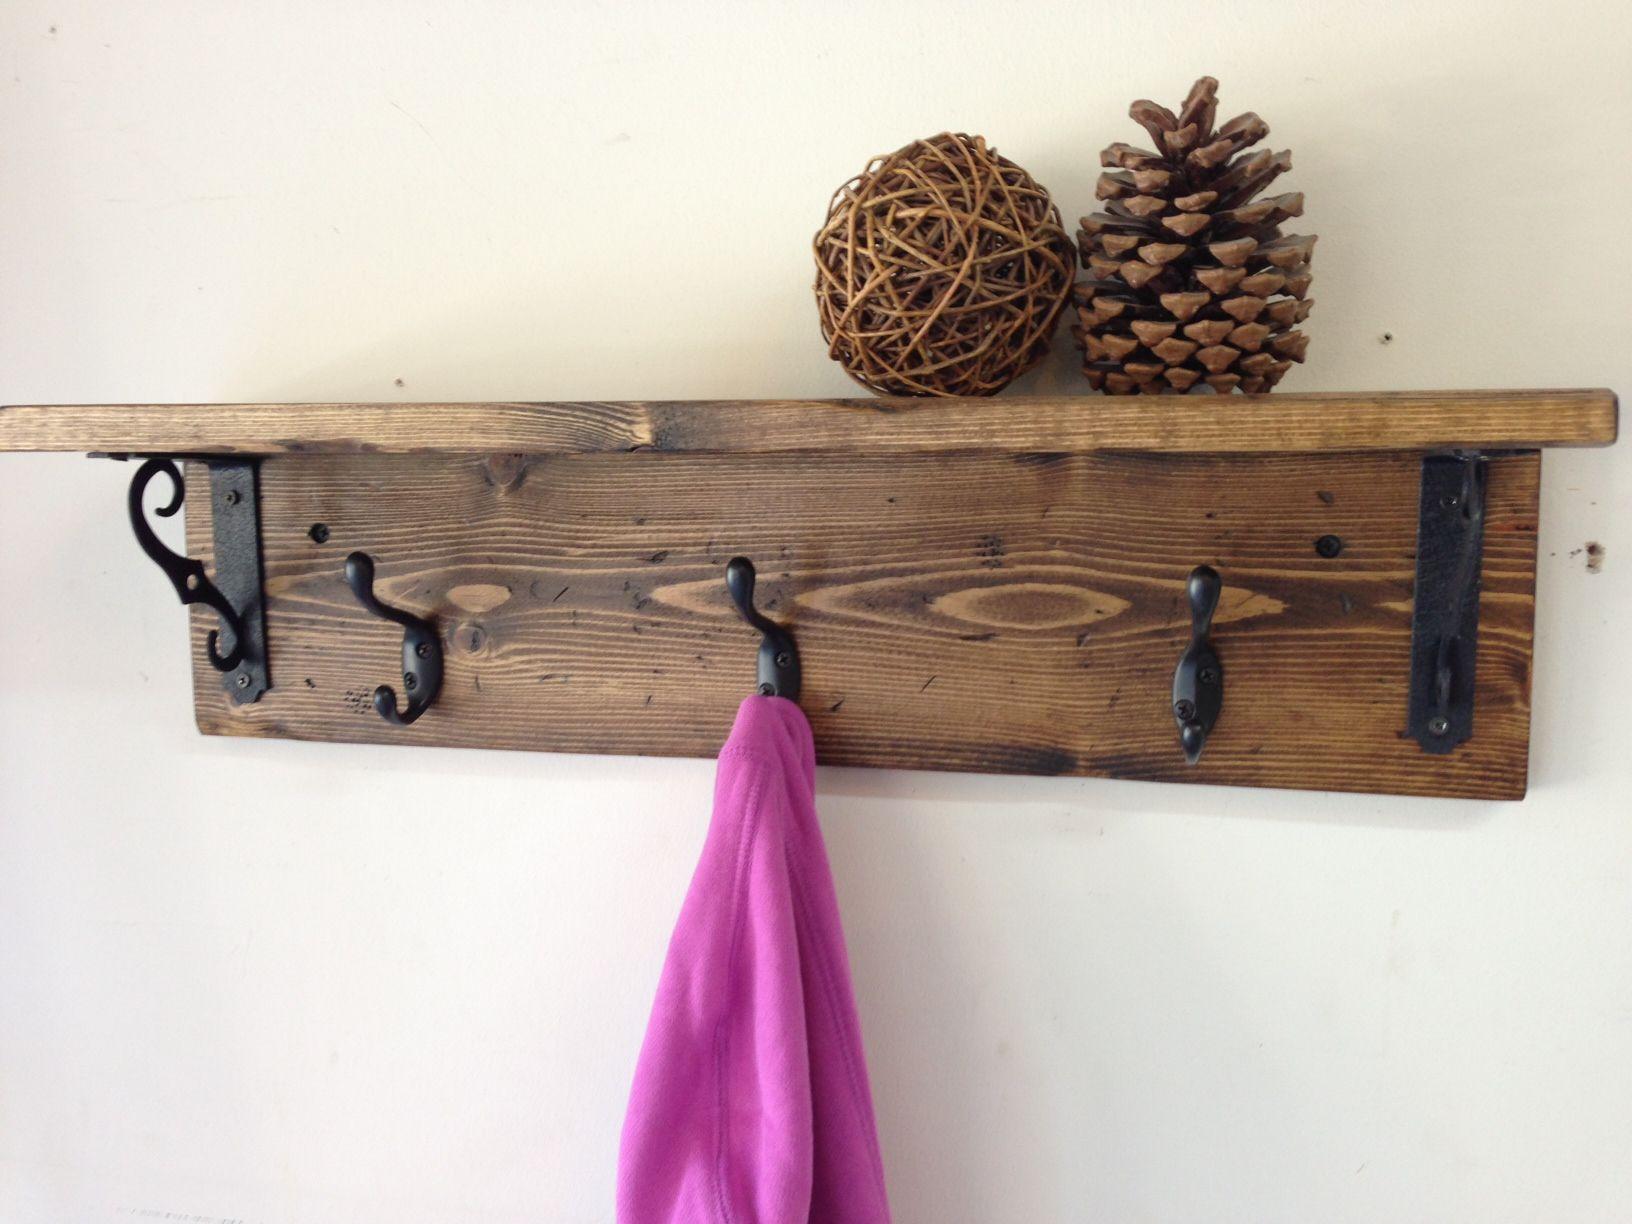 Handmade wall mount rustic wood coat rack with shelf a